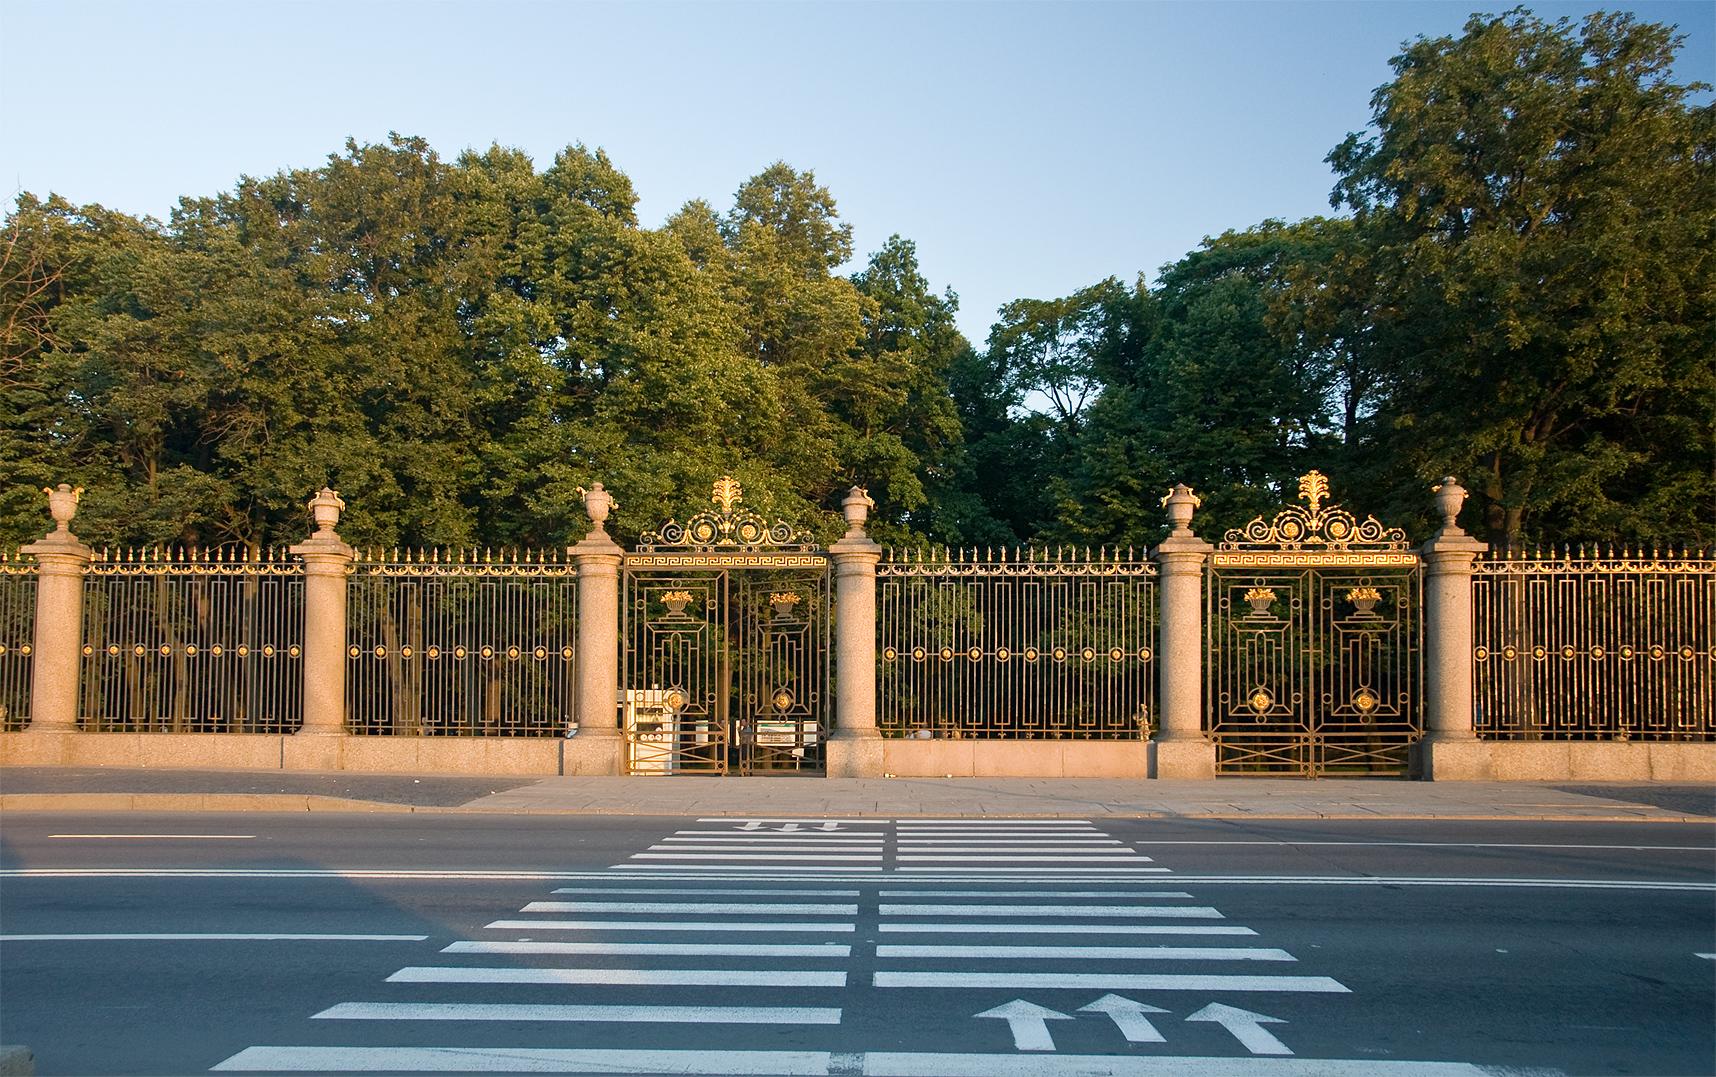 Решётка Летнего сада — один из символов Санкт-Петербурга.jpg